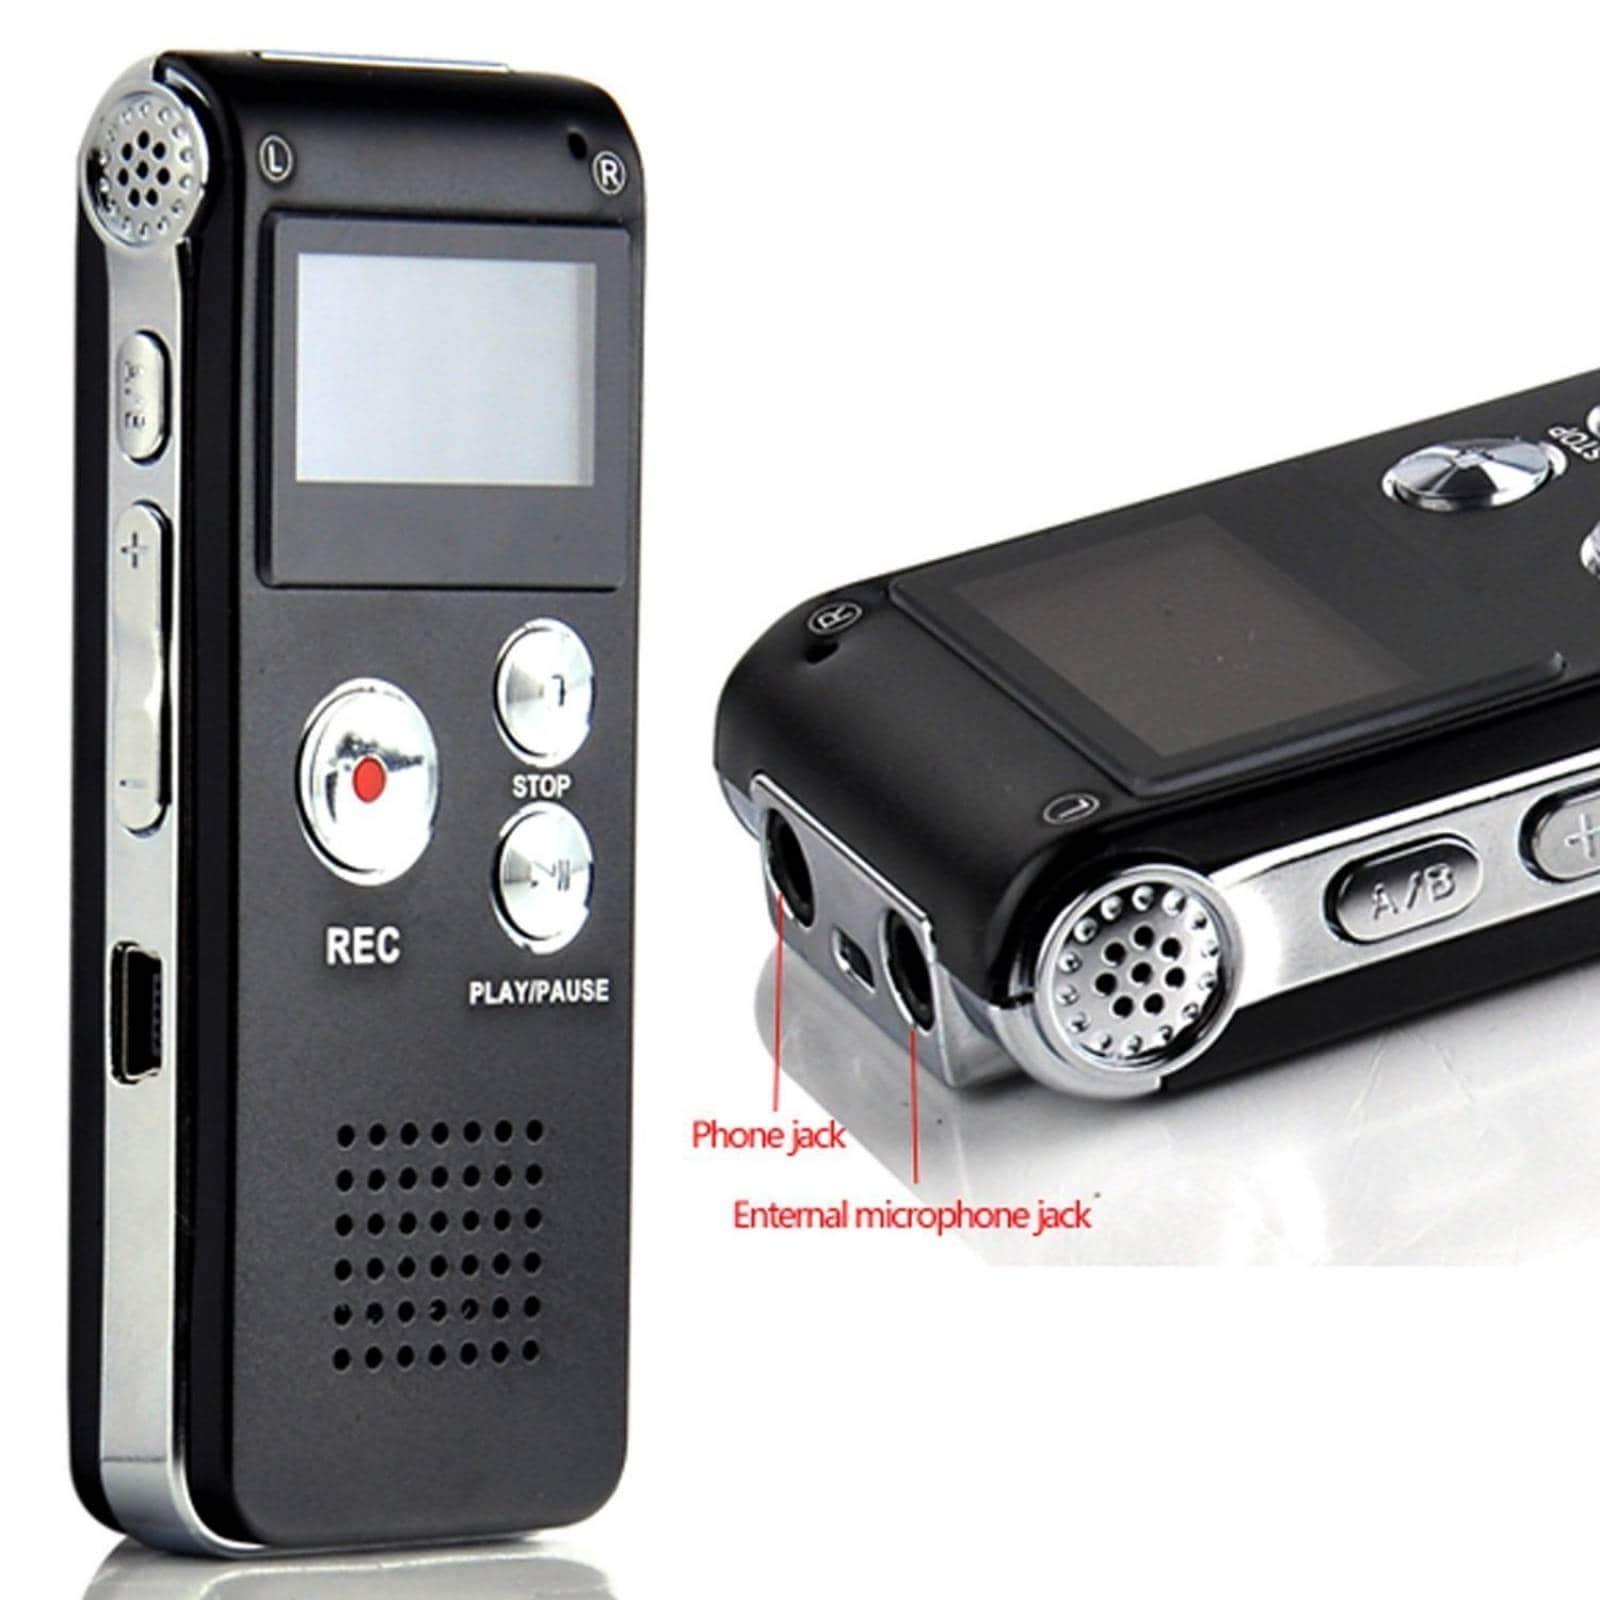 Aketek multifuncional recargable HR 650 8GB grabadora -Negro